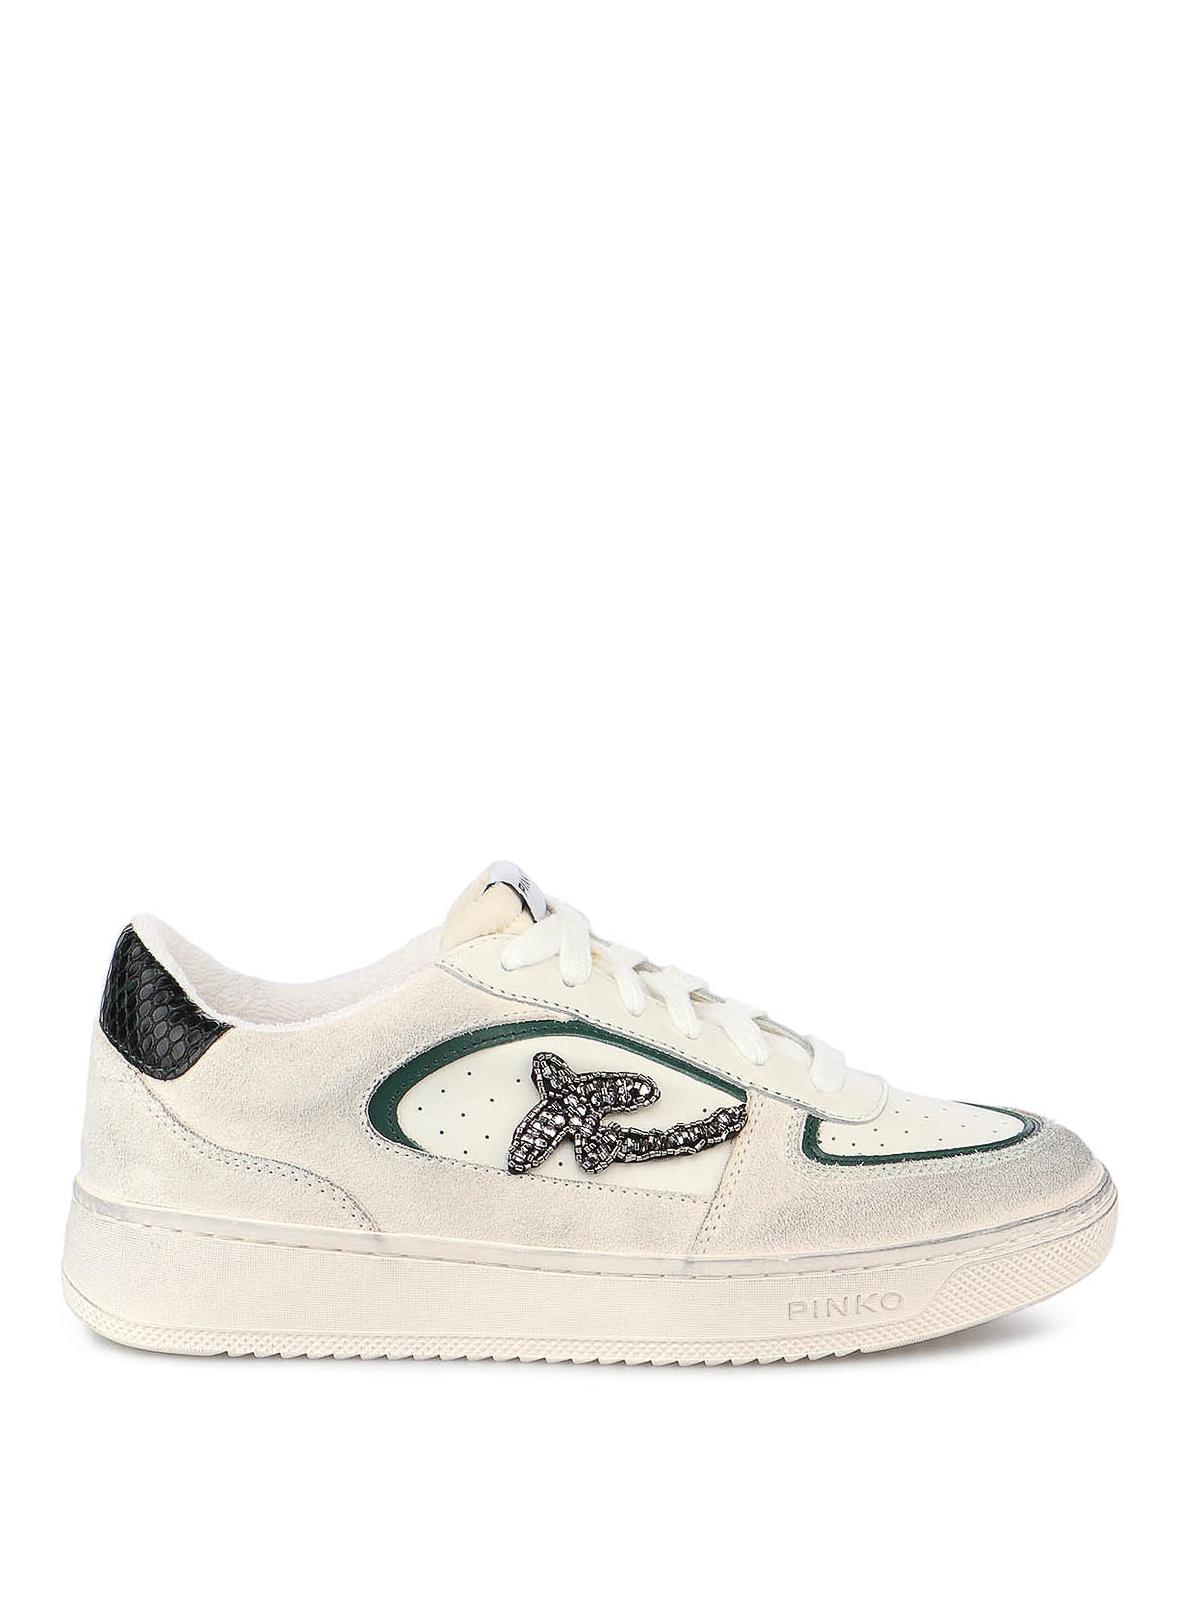 Pinko Sneakers LIQUIRIZIA LOW TOP 1 SNEAKERS